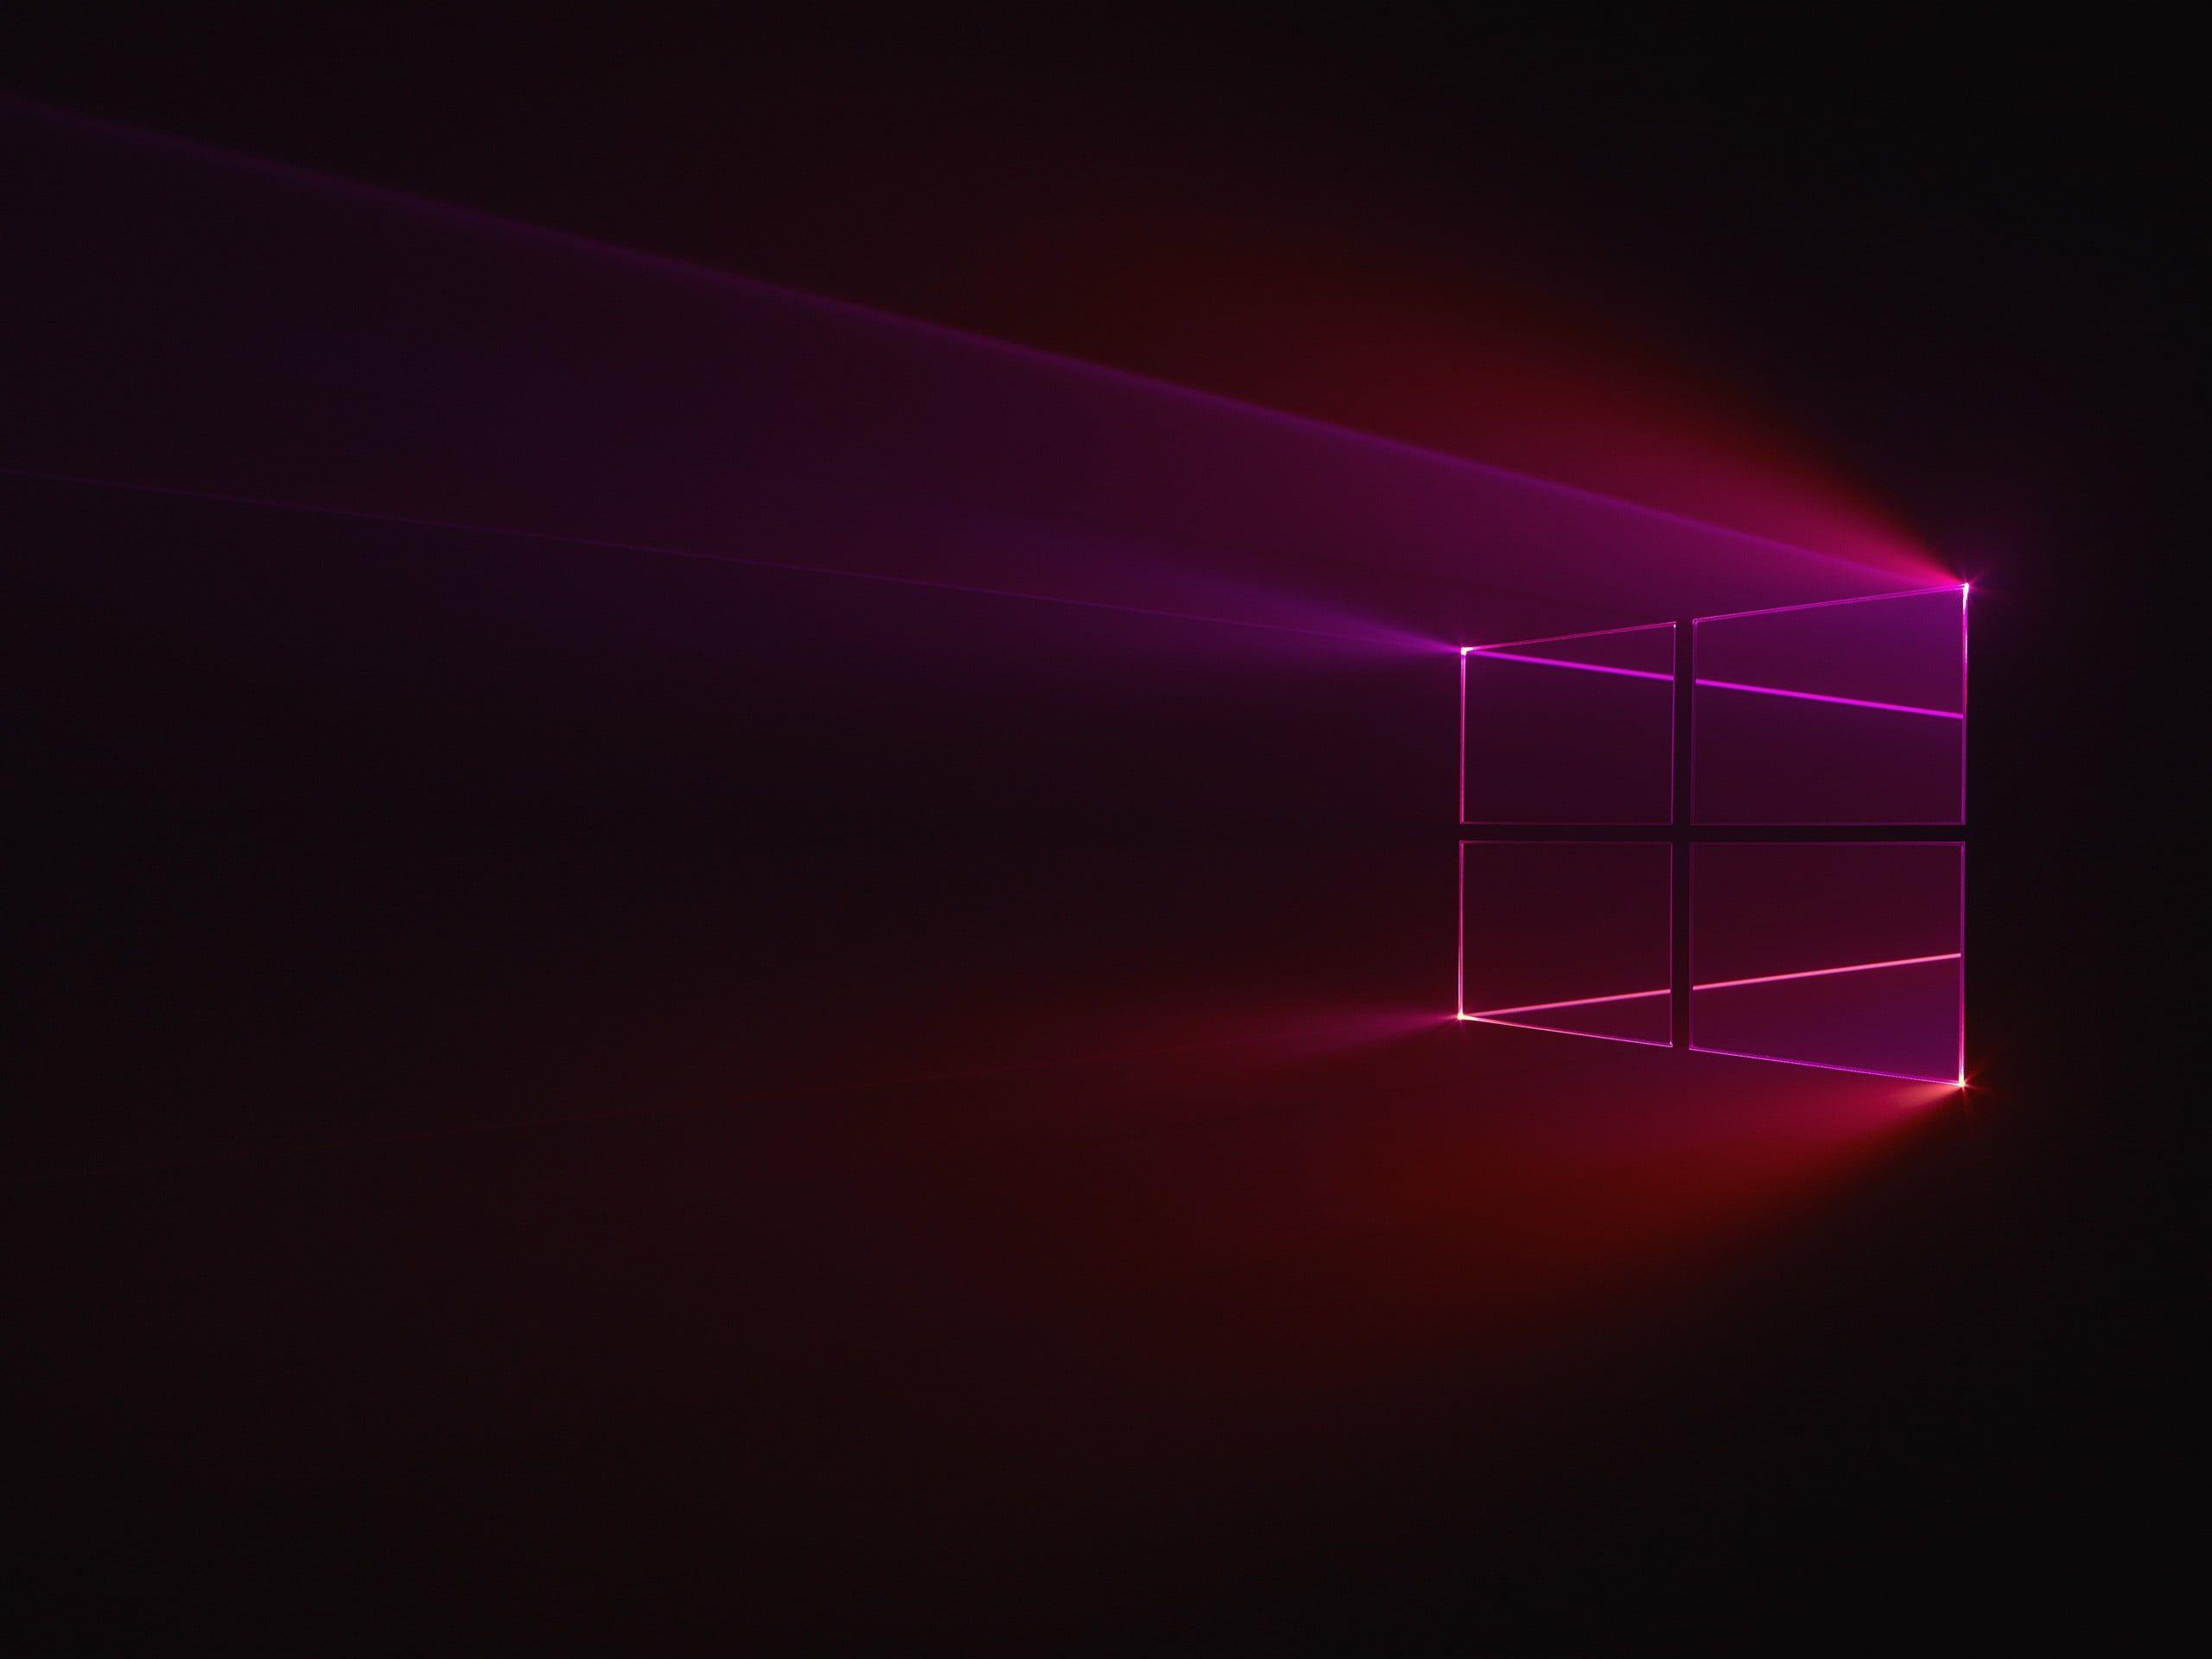 Windows 10 Logo Windows 10 Abstract Gmunk 2k Wallpaper Hdwallpaper Desktop Wallpaper Windows 10 Windows 10 Windows